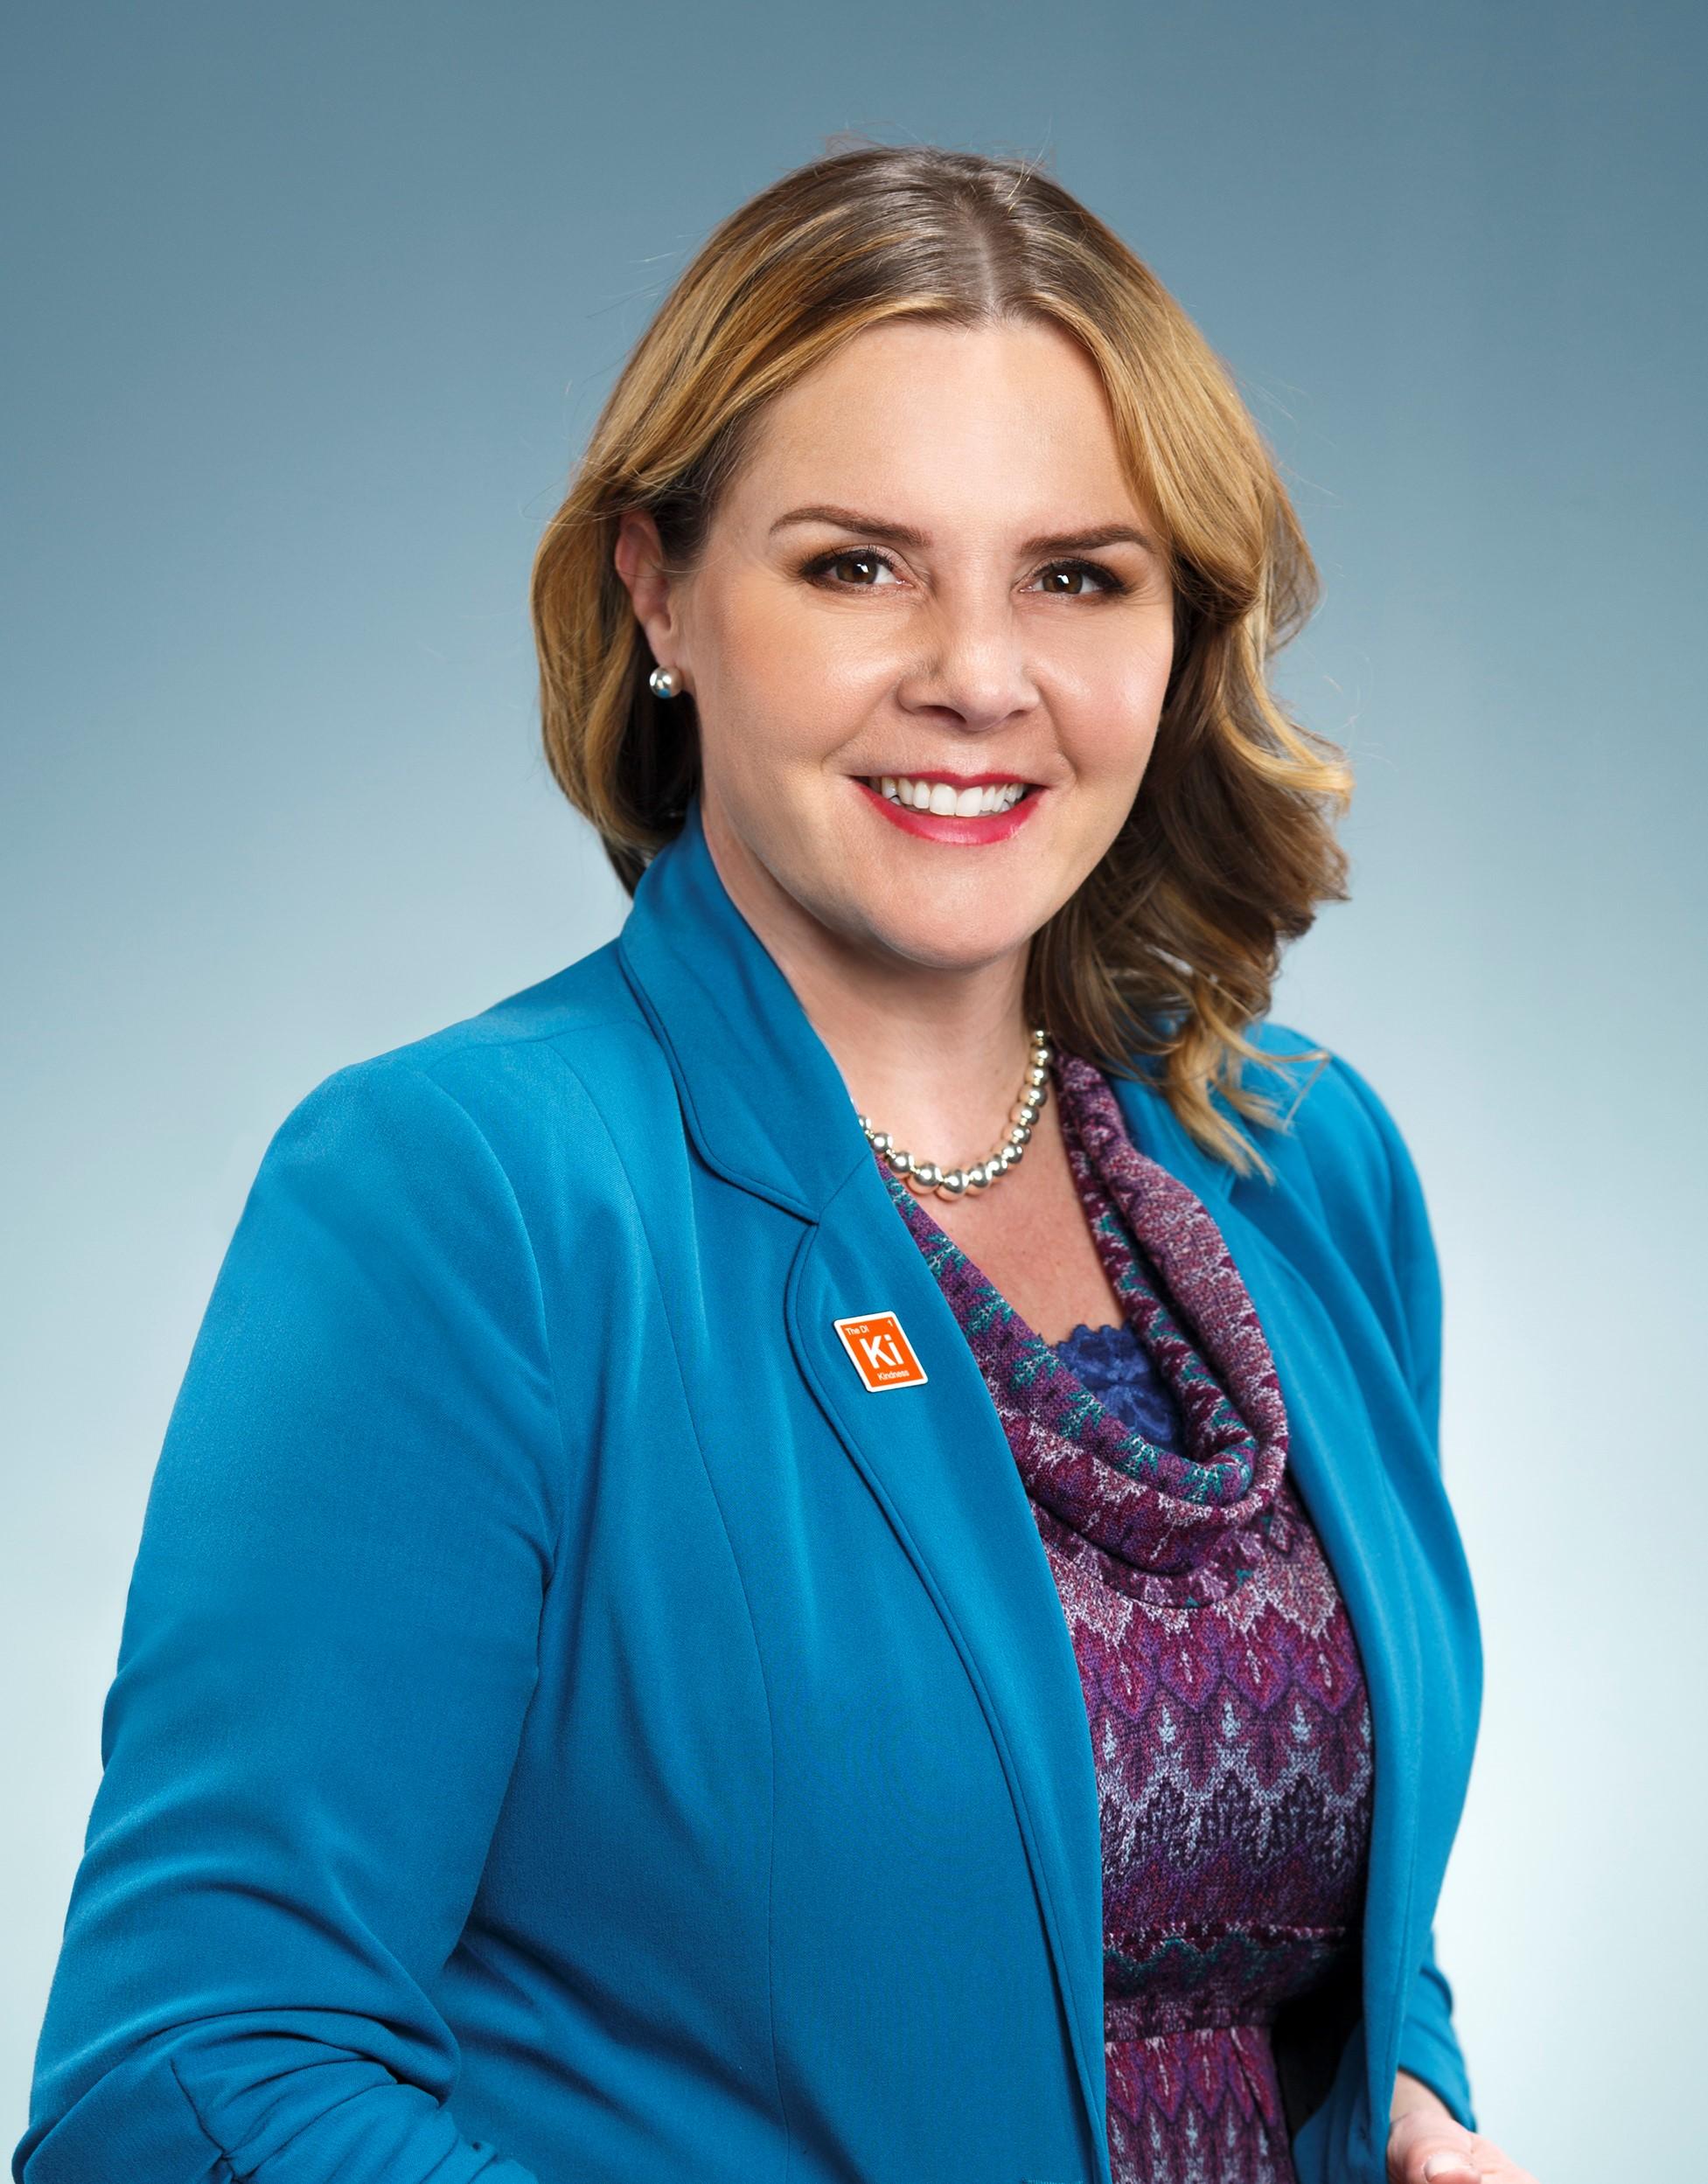 Helen Wetherley Knight, MBA